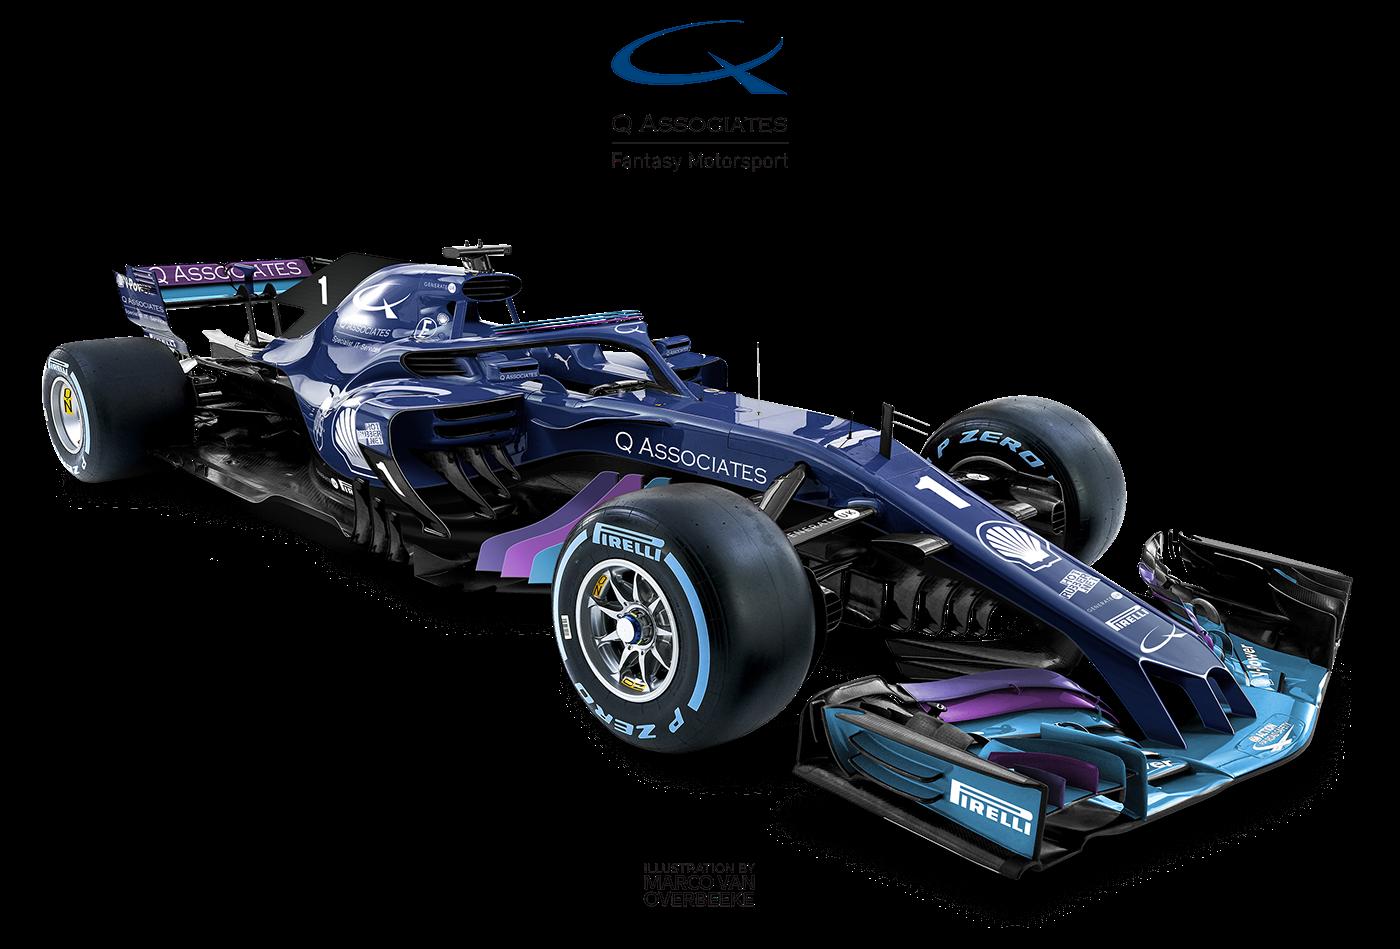 2018 Formula 1 fantasy concept   Q Associates UK on Behance